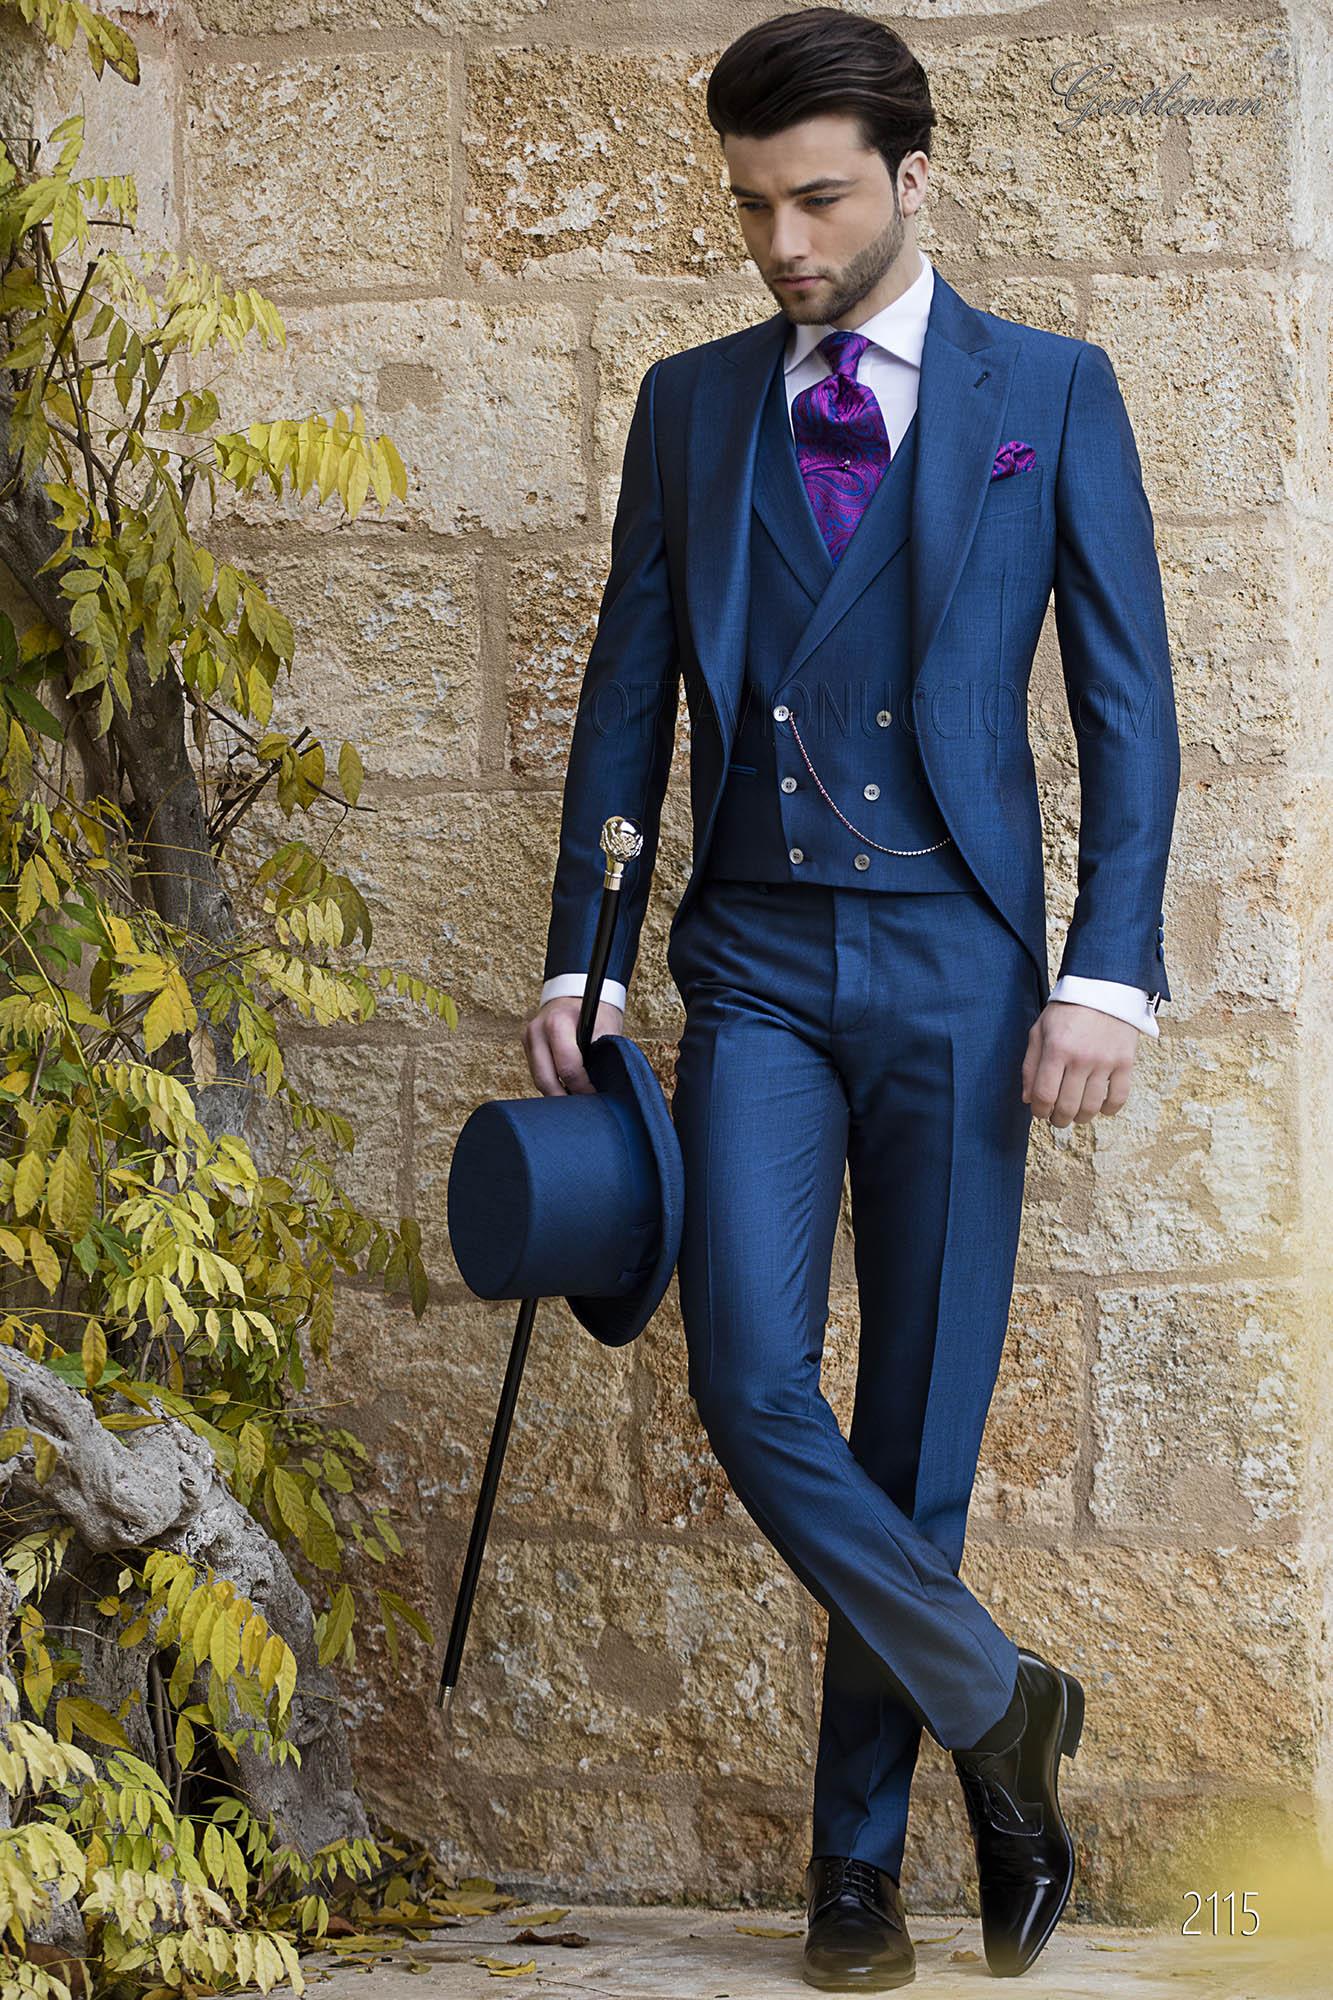 costume bleu electrique pour homme mariage tissu alpaga. Black Bedroom Furniture Sets. Home Design Ideas